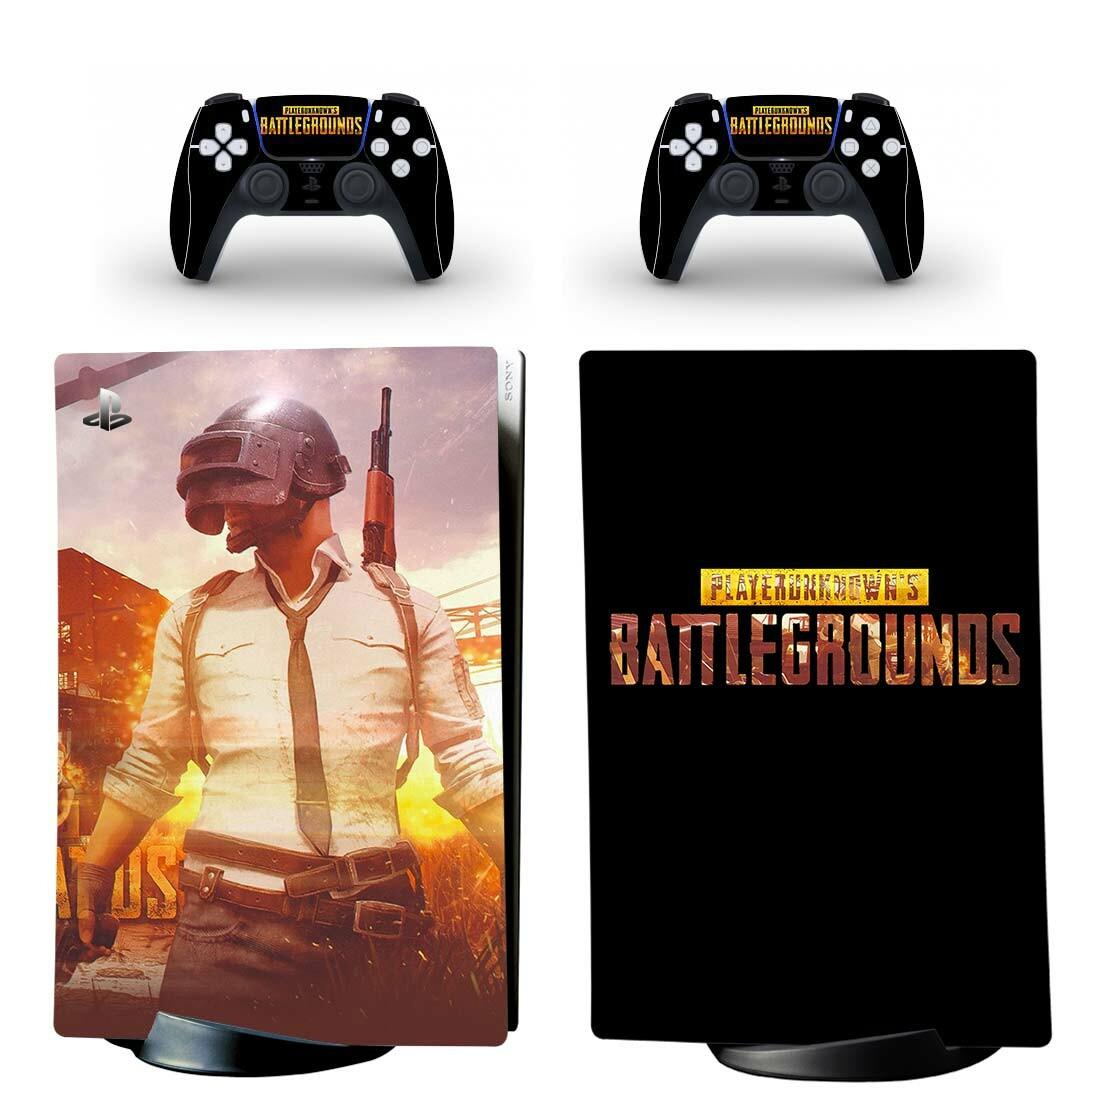 PlayerUnknown's Battlegrounds PS5 Digital Edition Skin Sticker Decal